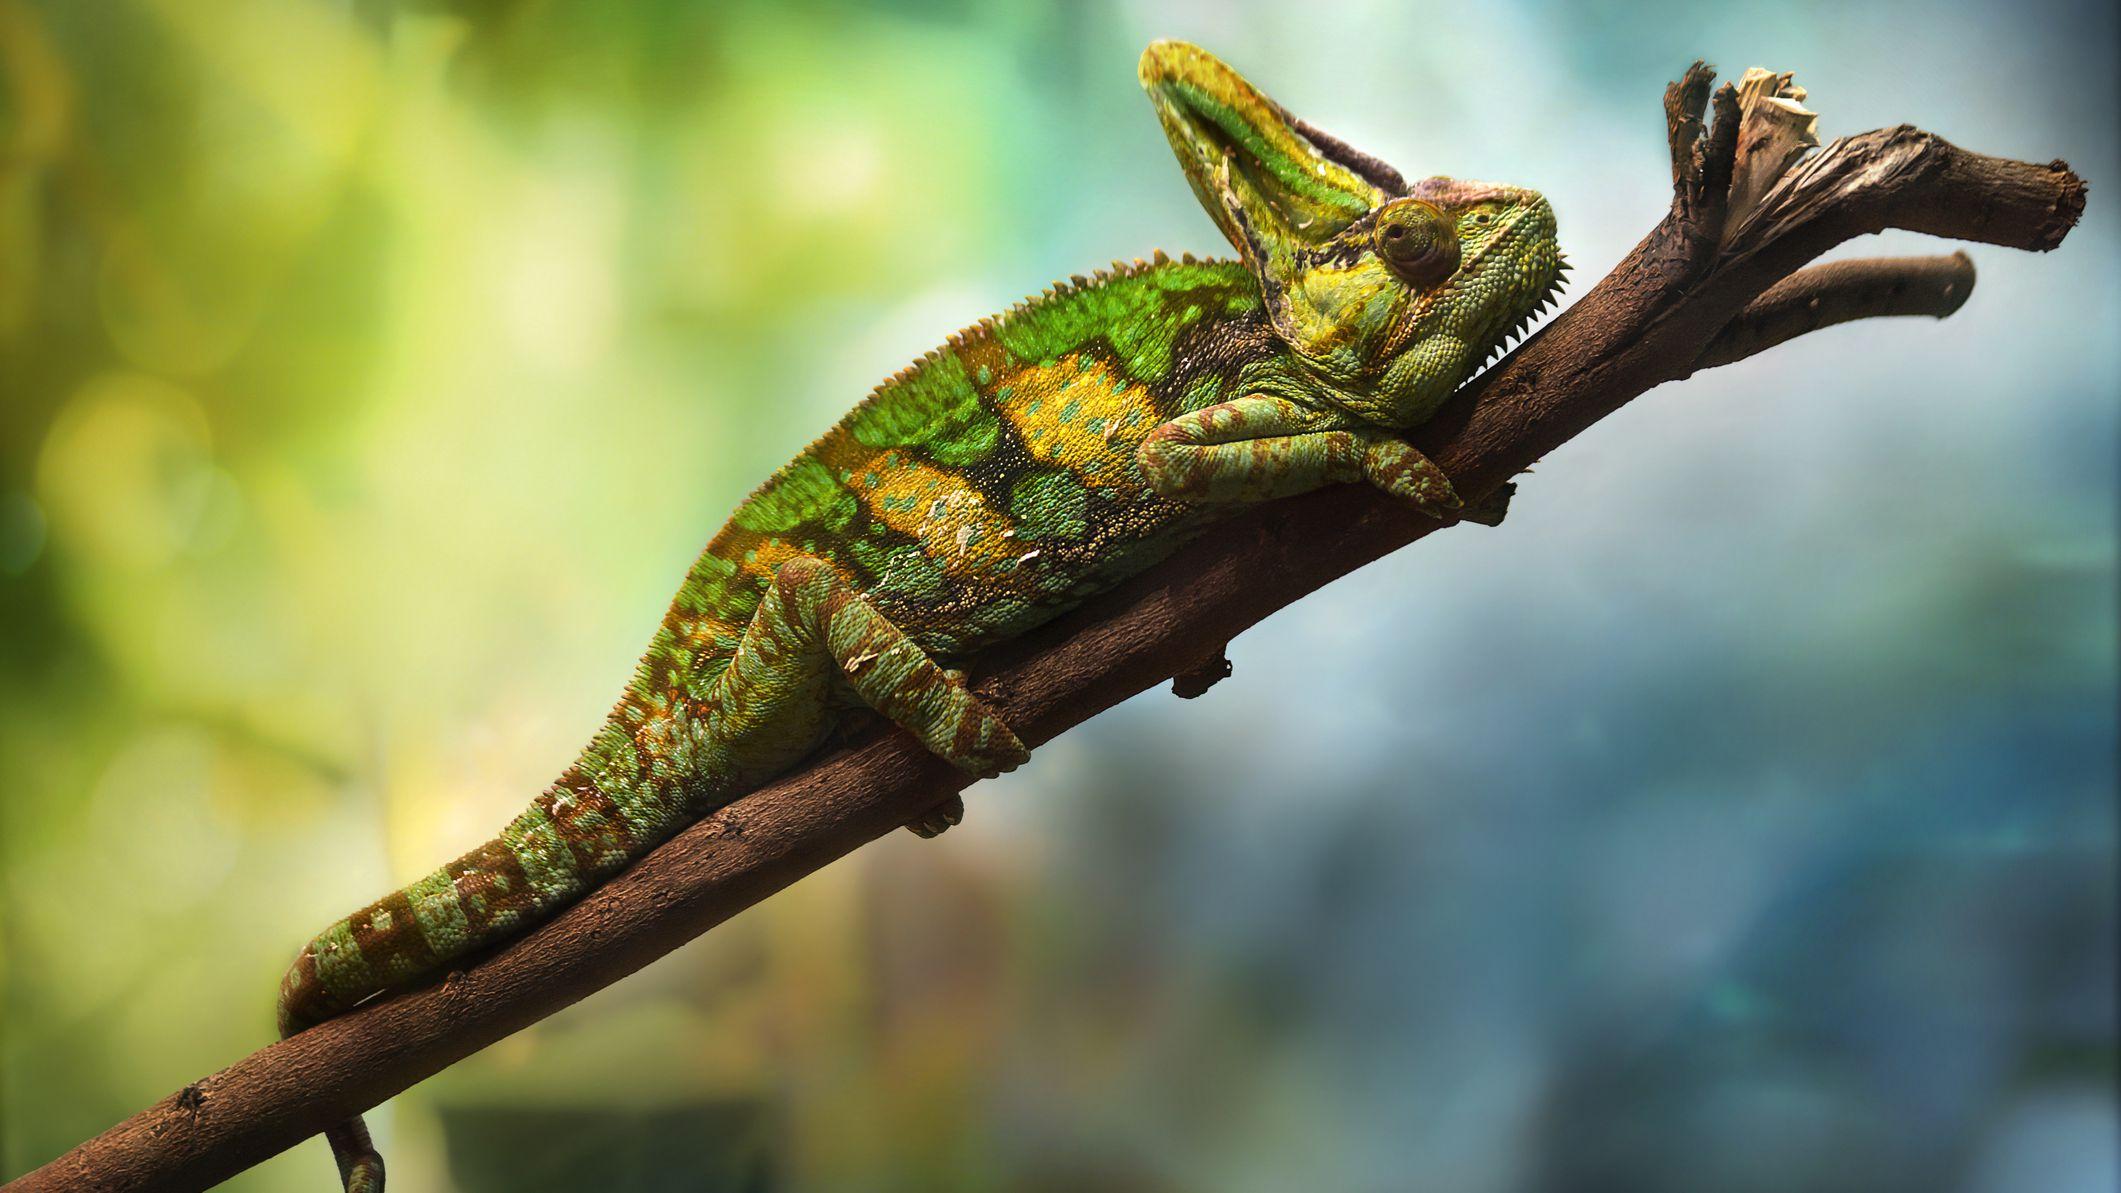 How To Care For Pet Veiled Chameleons